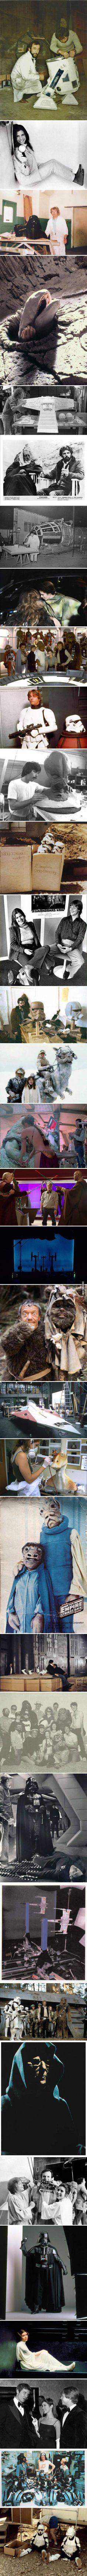 Star Wars 1-7 Behind The Scenes Photos (Part 4)